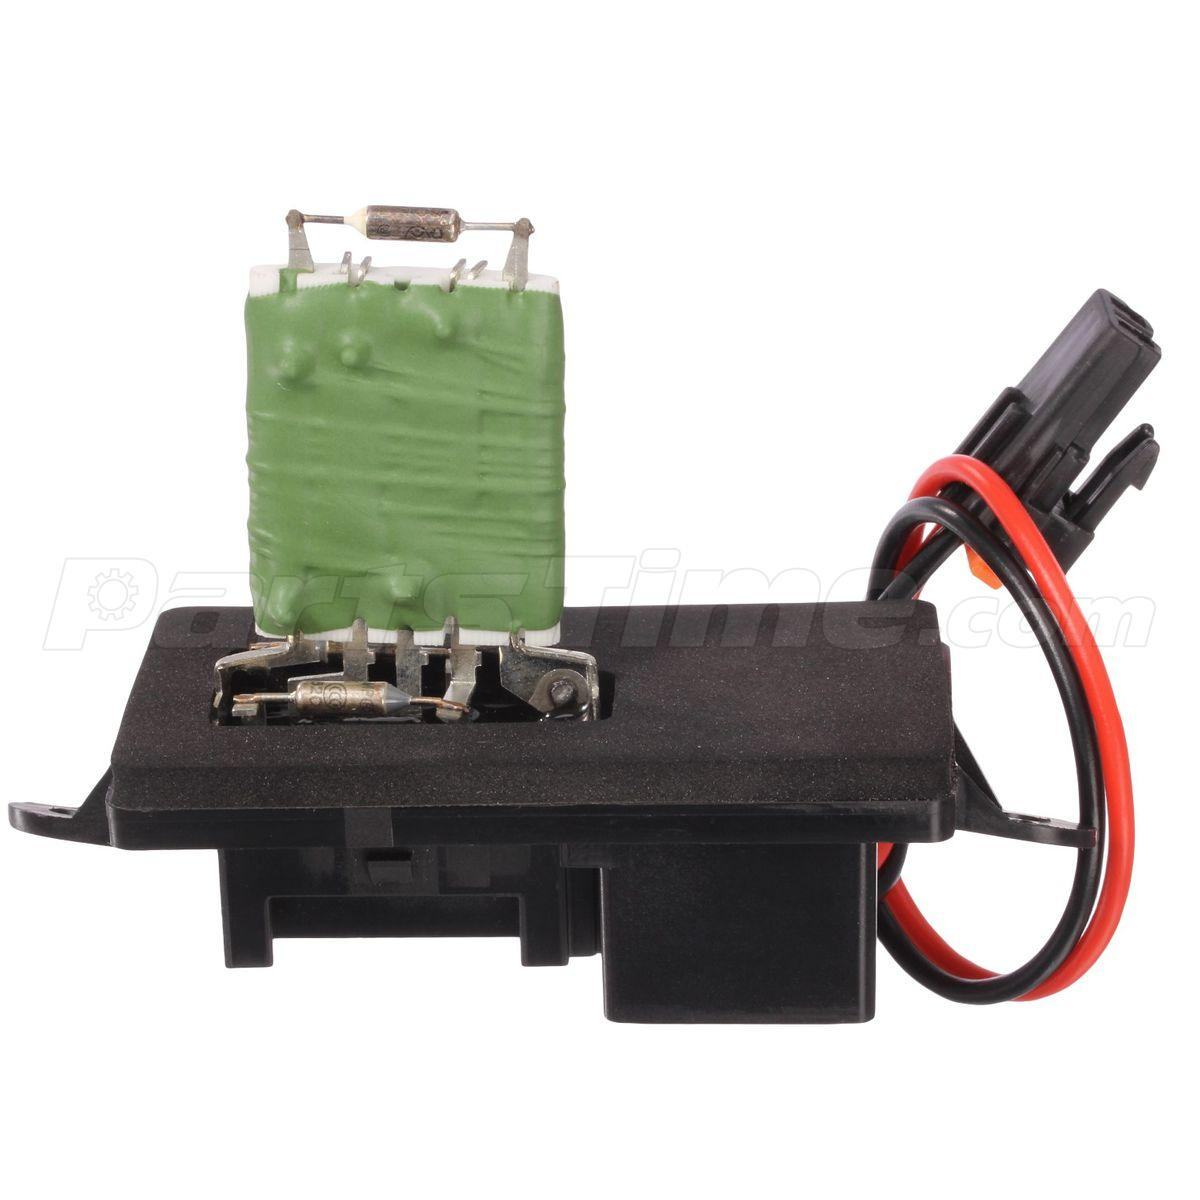 cbt1c110 blower motor wiring harness cbt1c110 similiar blower motor resistor wiring keywords on cbt1c110 blower motor wiring harness